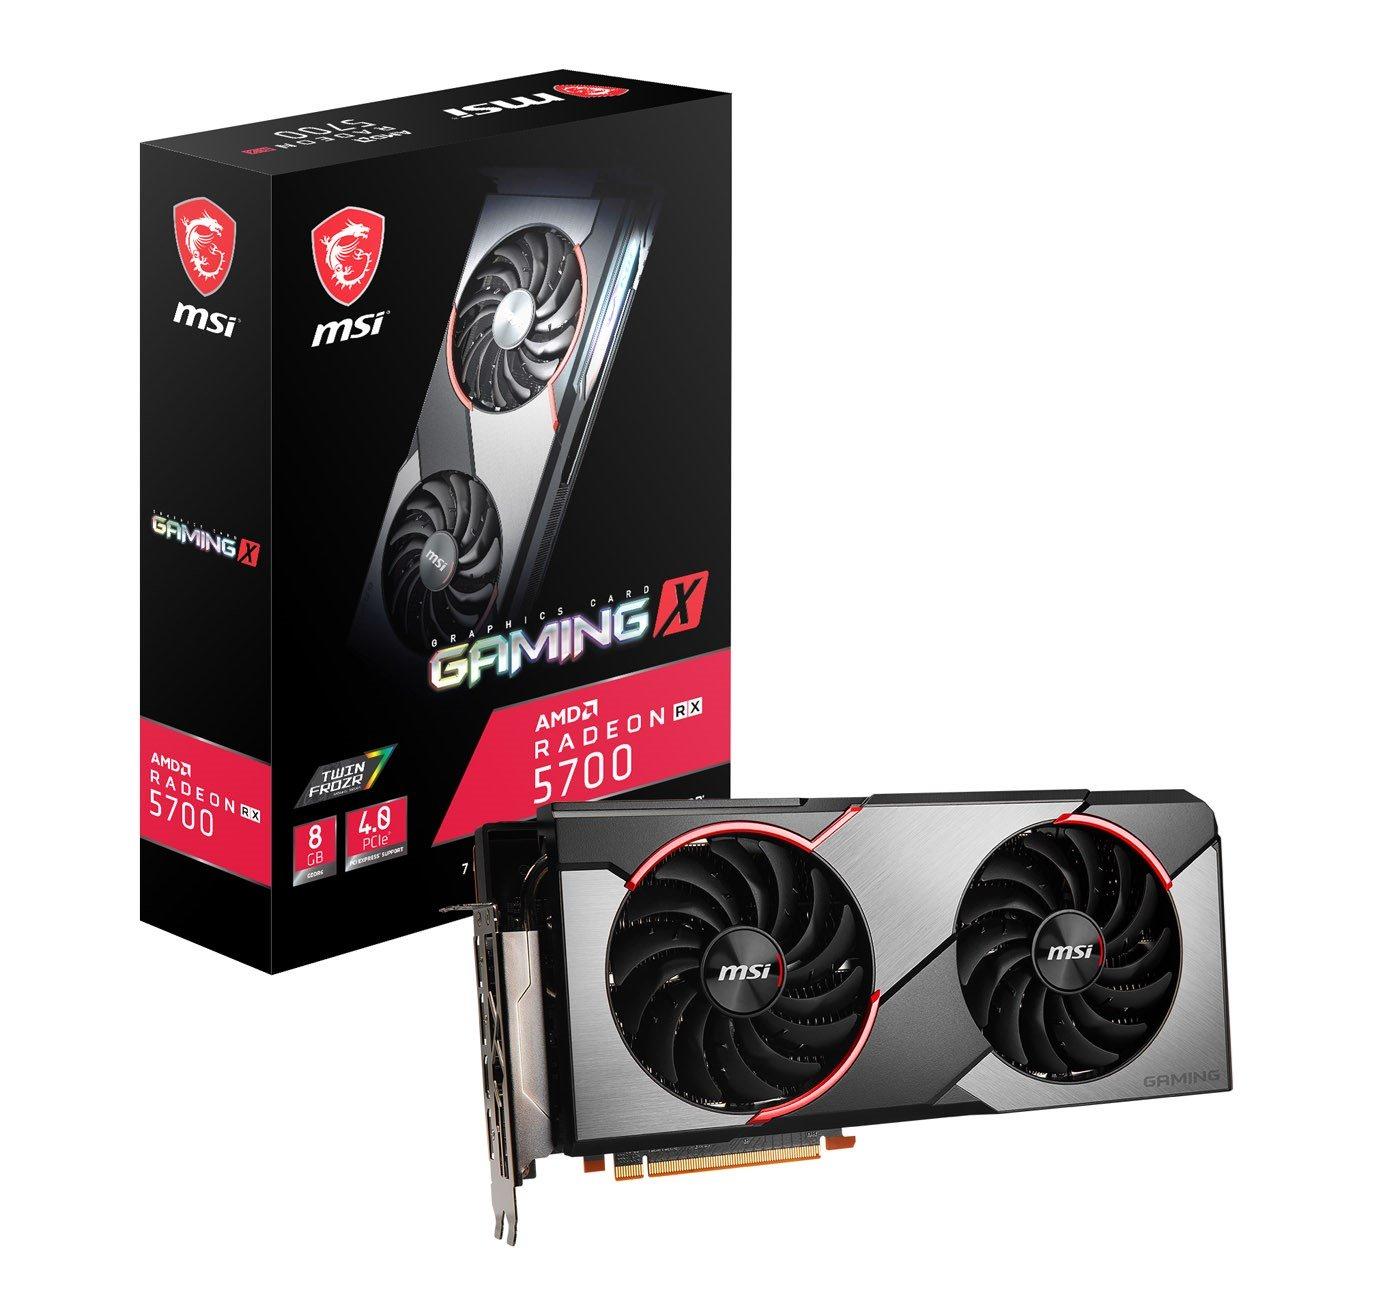 AMD MSI Radeon RX 5700 Gaming X 8GB + GRY od AMD